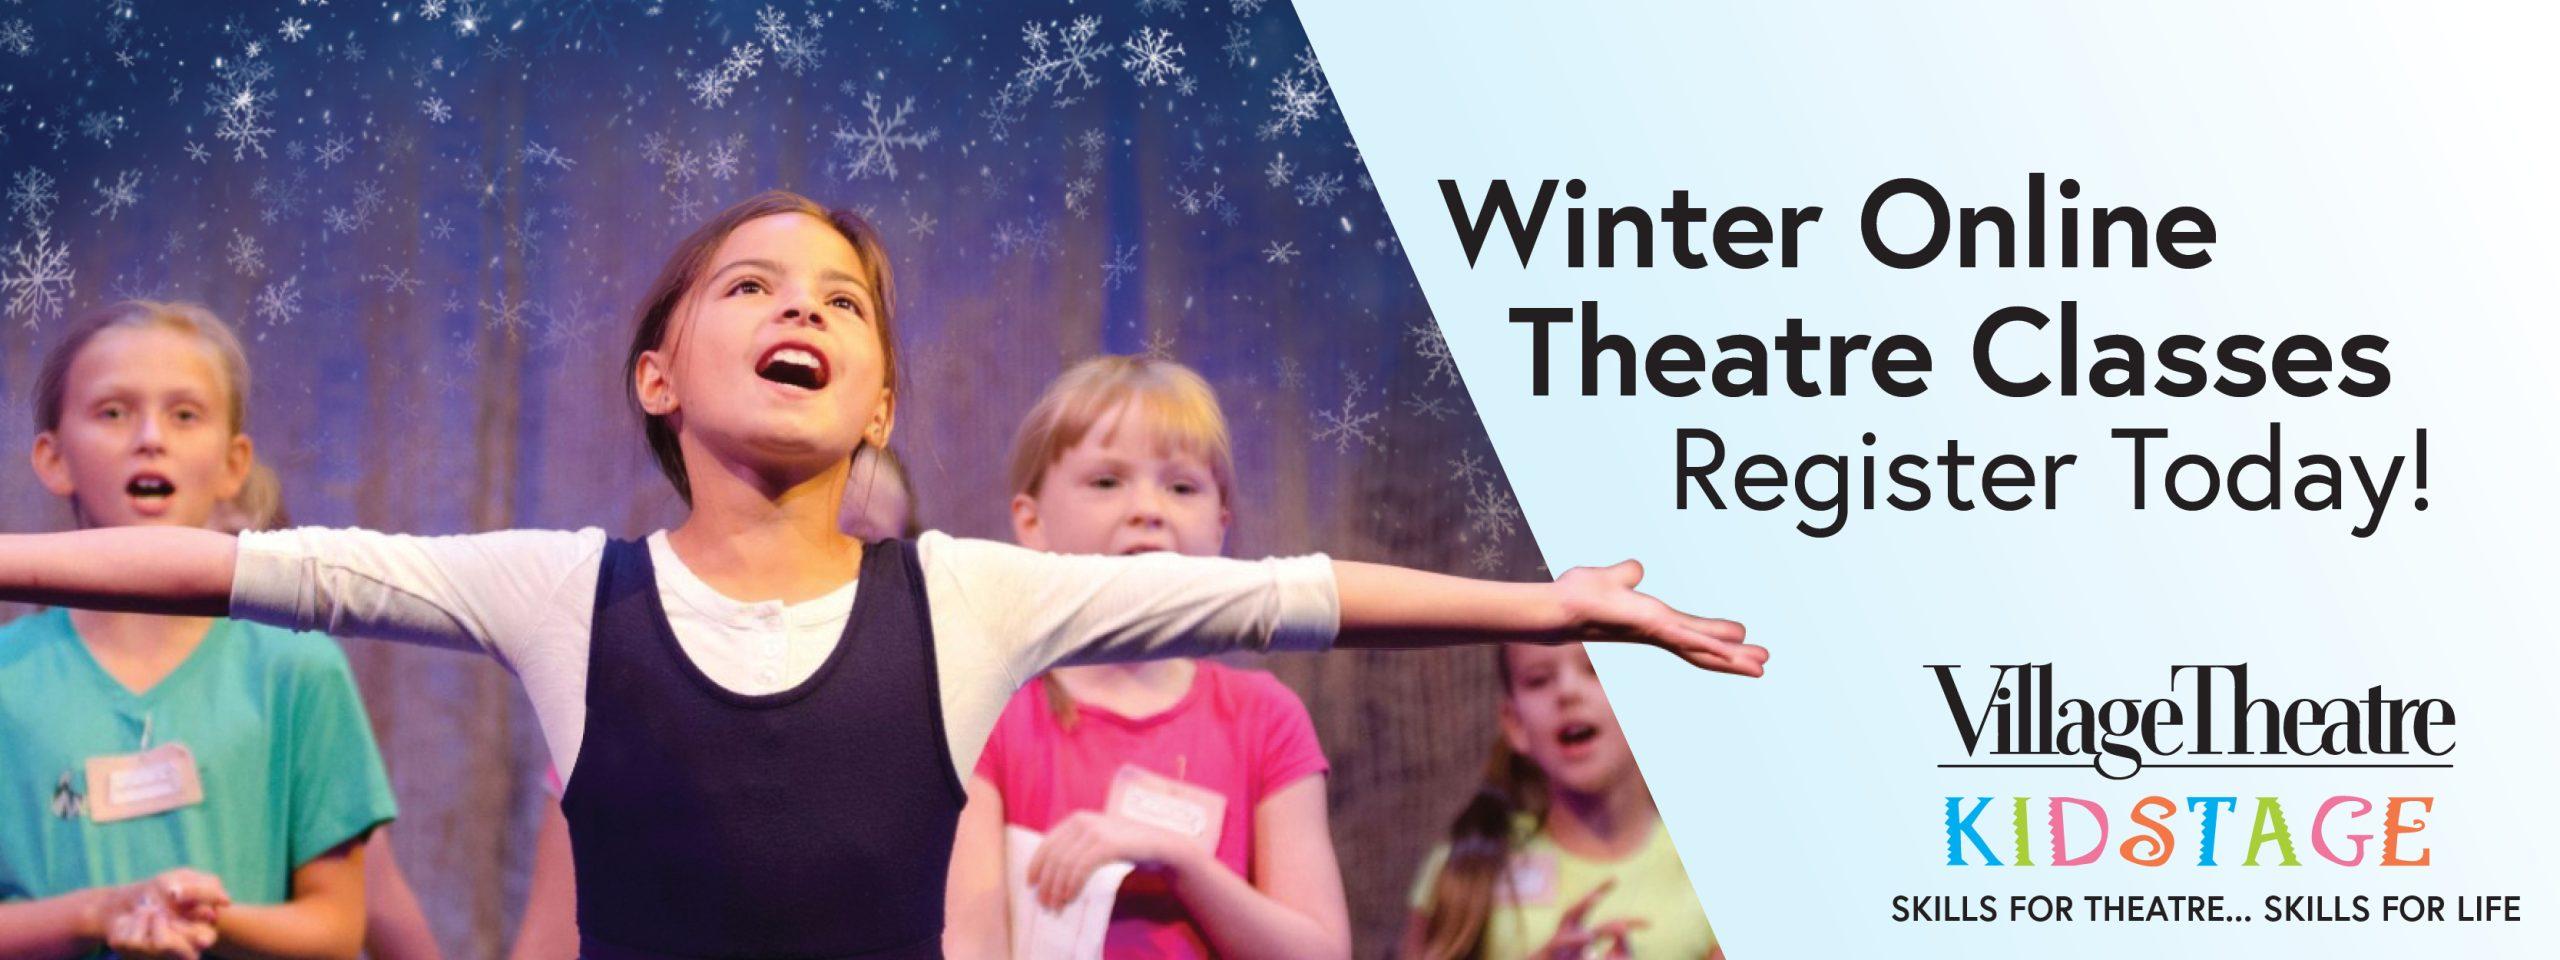 KIDSTAGE Winter Online Theatre Classes: Register Today